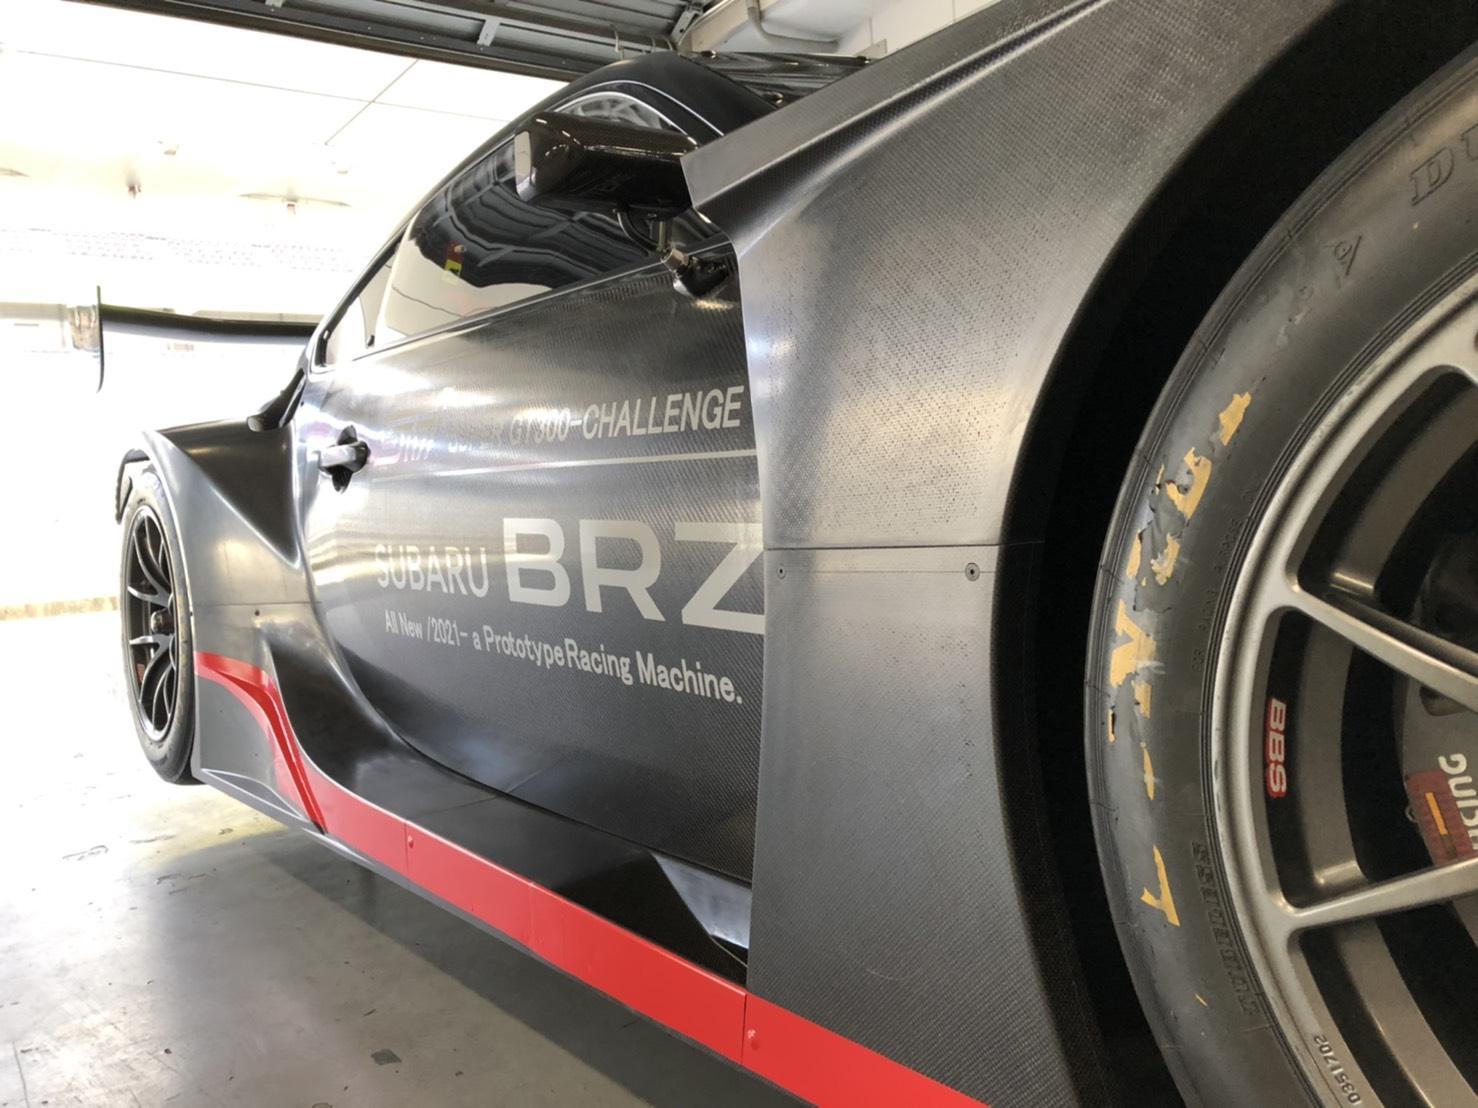 2021 Subaru BRZ GT300 side